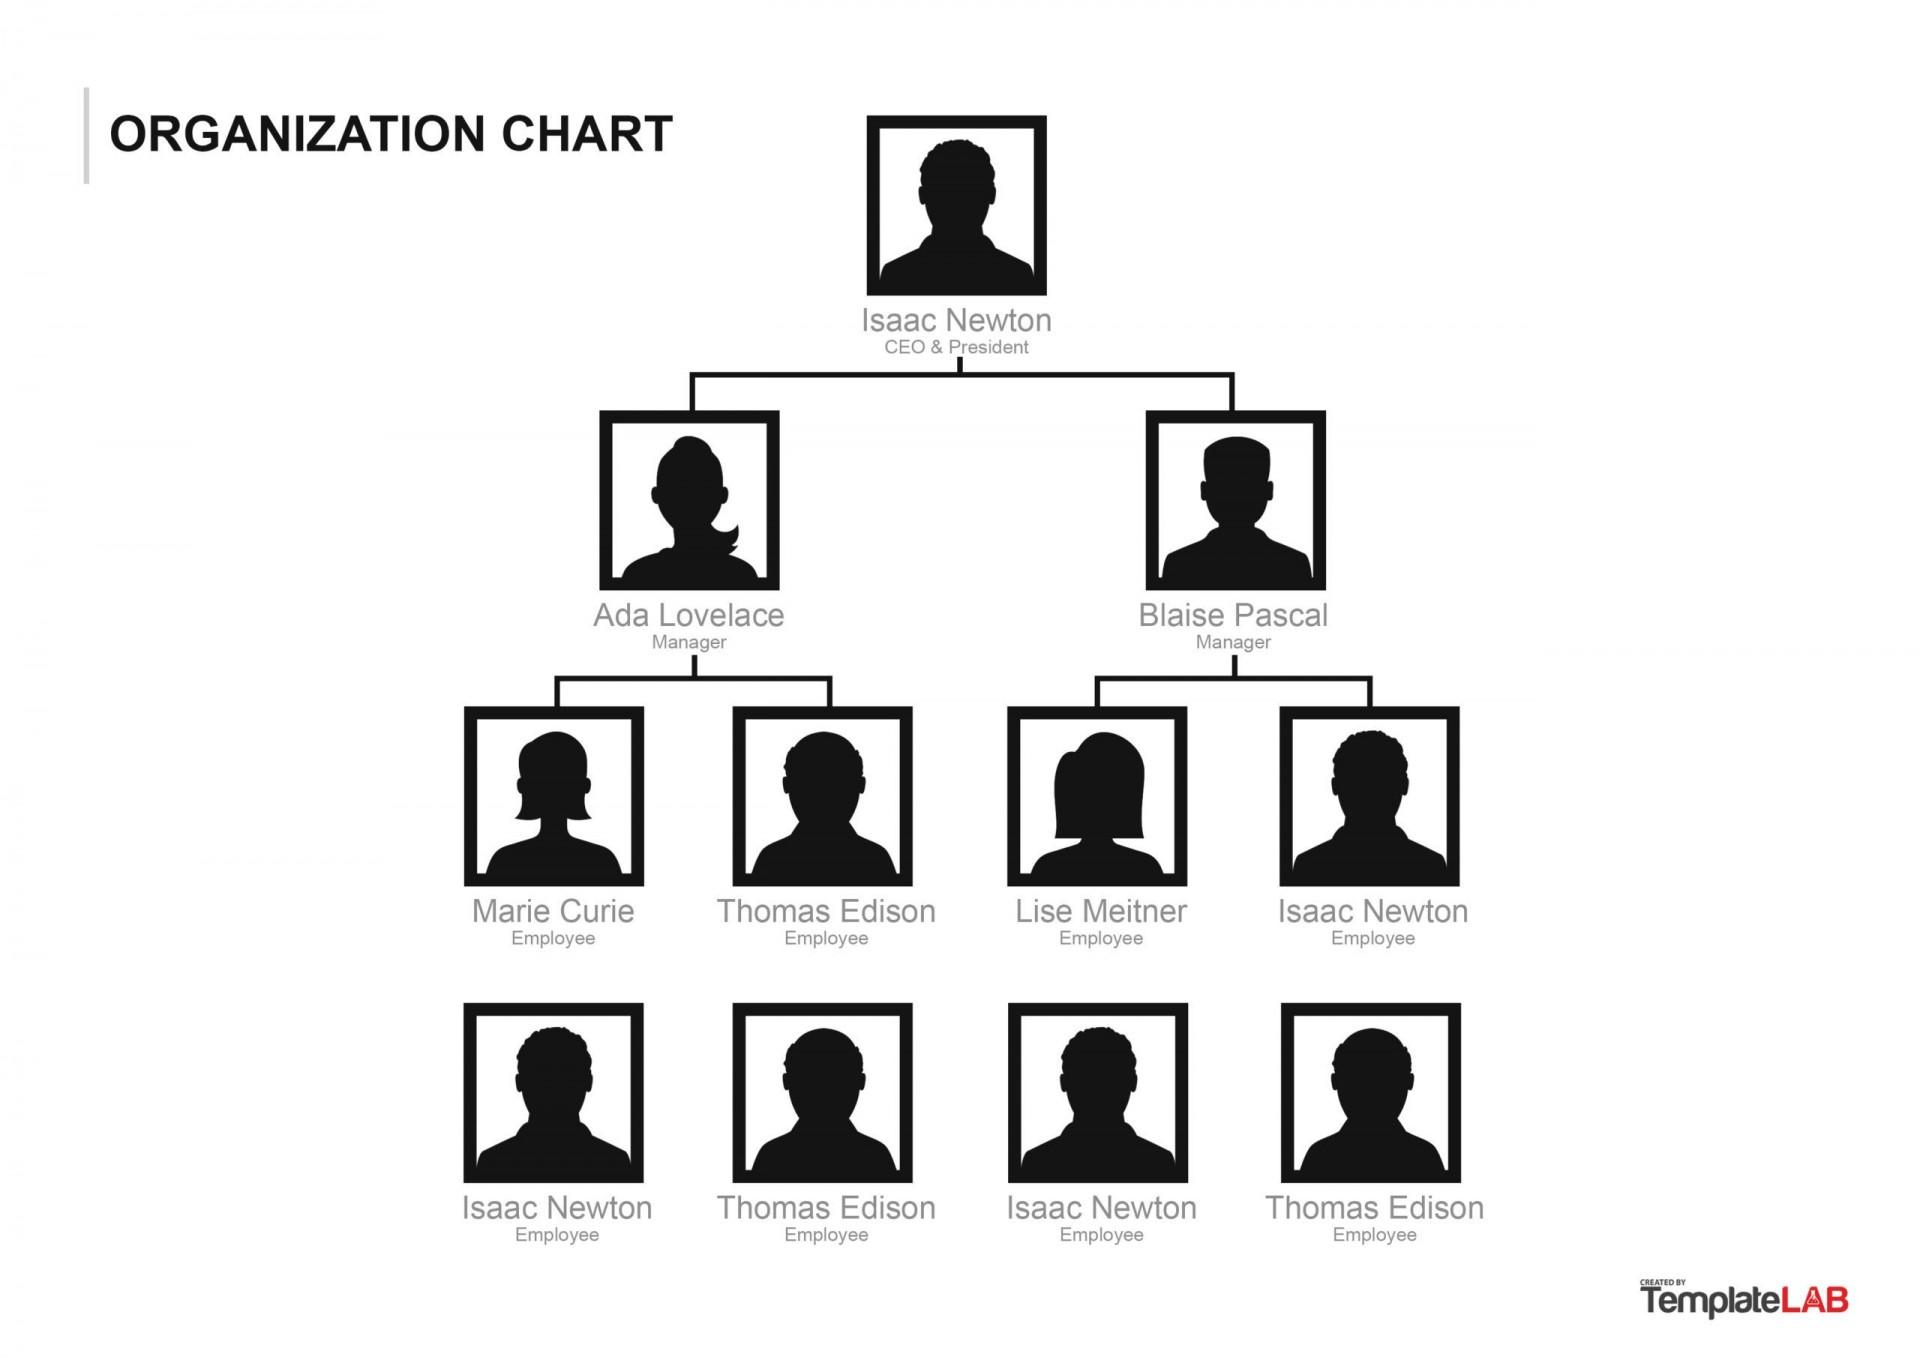 009 Incredible Microsoft Word Organization Chart Template Design  Organizational Download 20071920